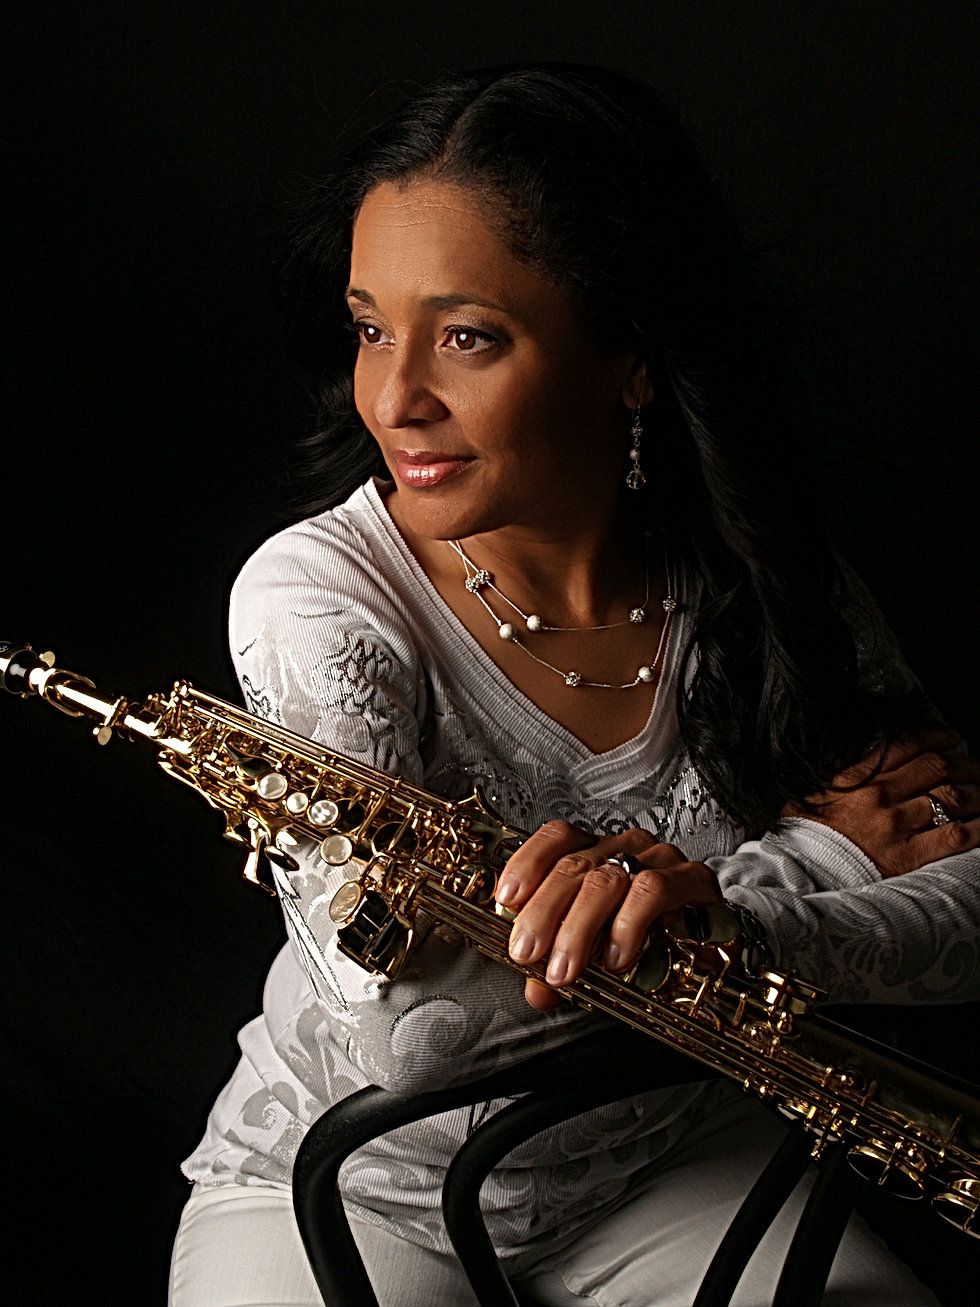 female saxophone player, live music streaming, wedding band, wedding music, Dallas Musician, best saxophone player, covid19 live streaming, women in jazz, texas musician, music festivals, corporate e